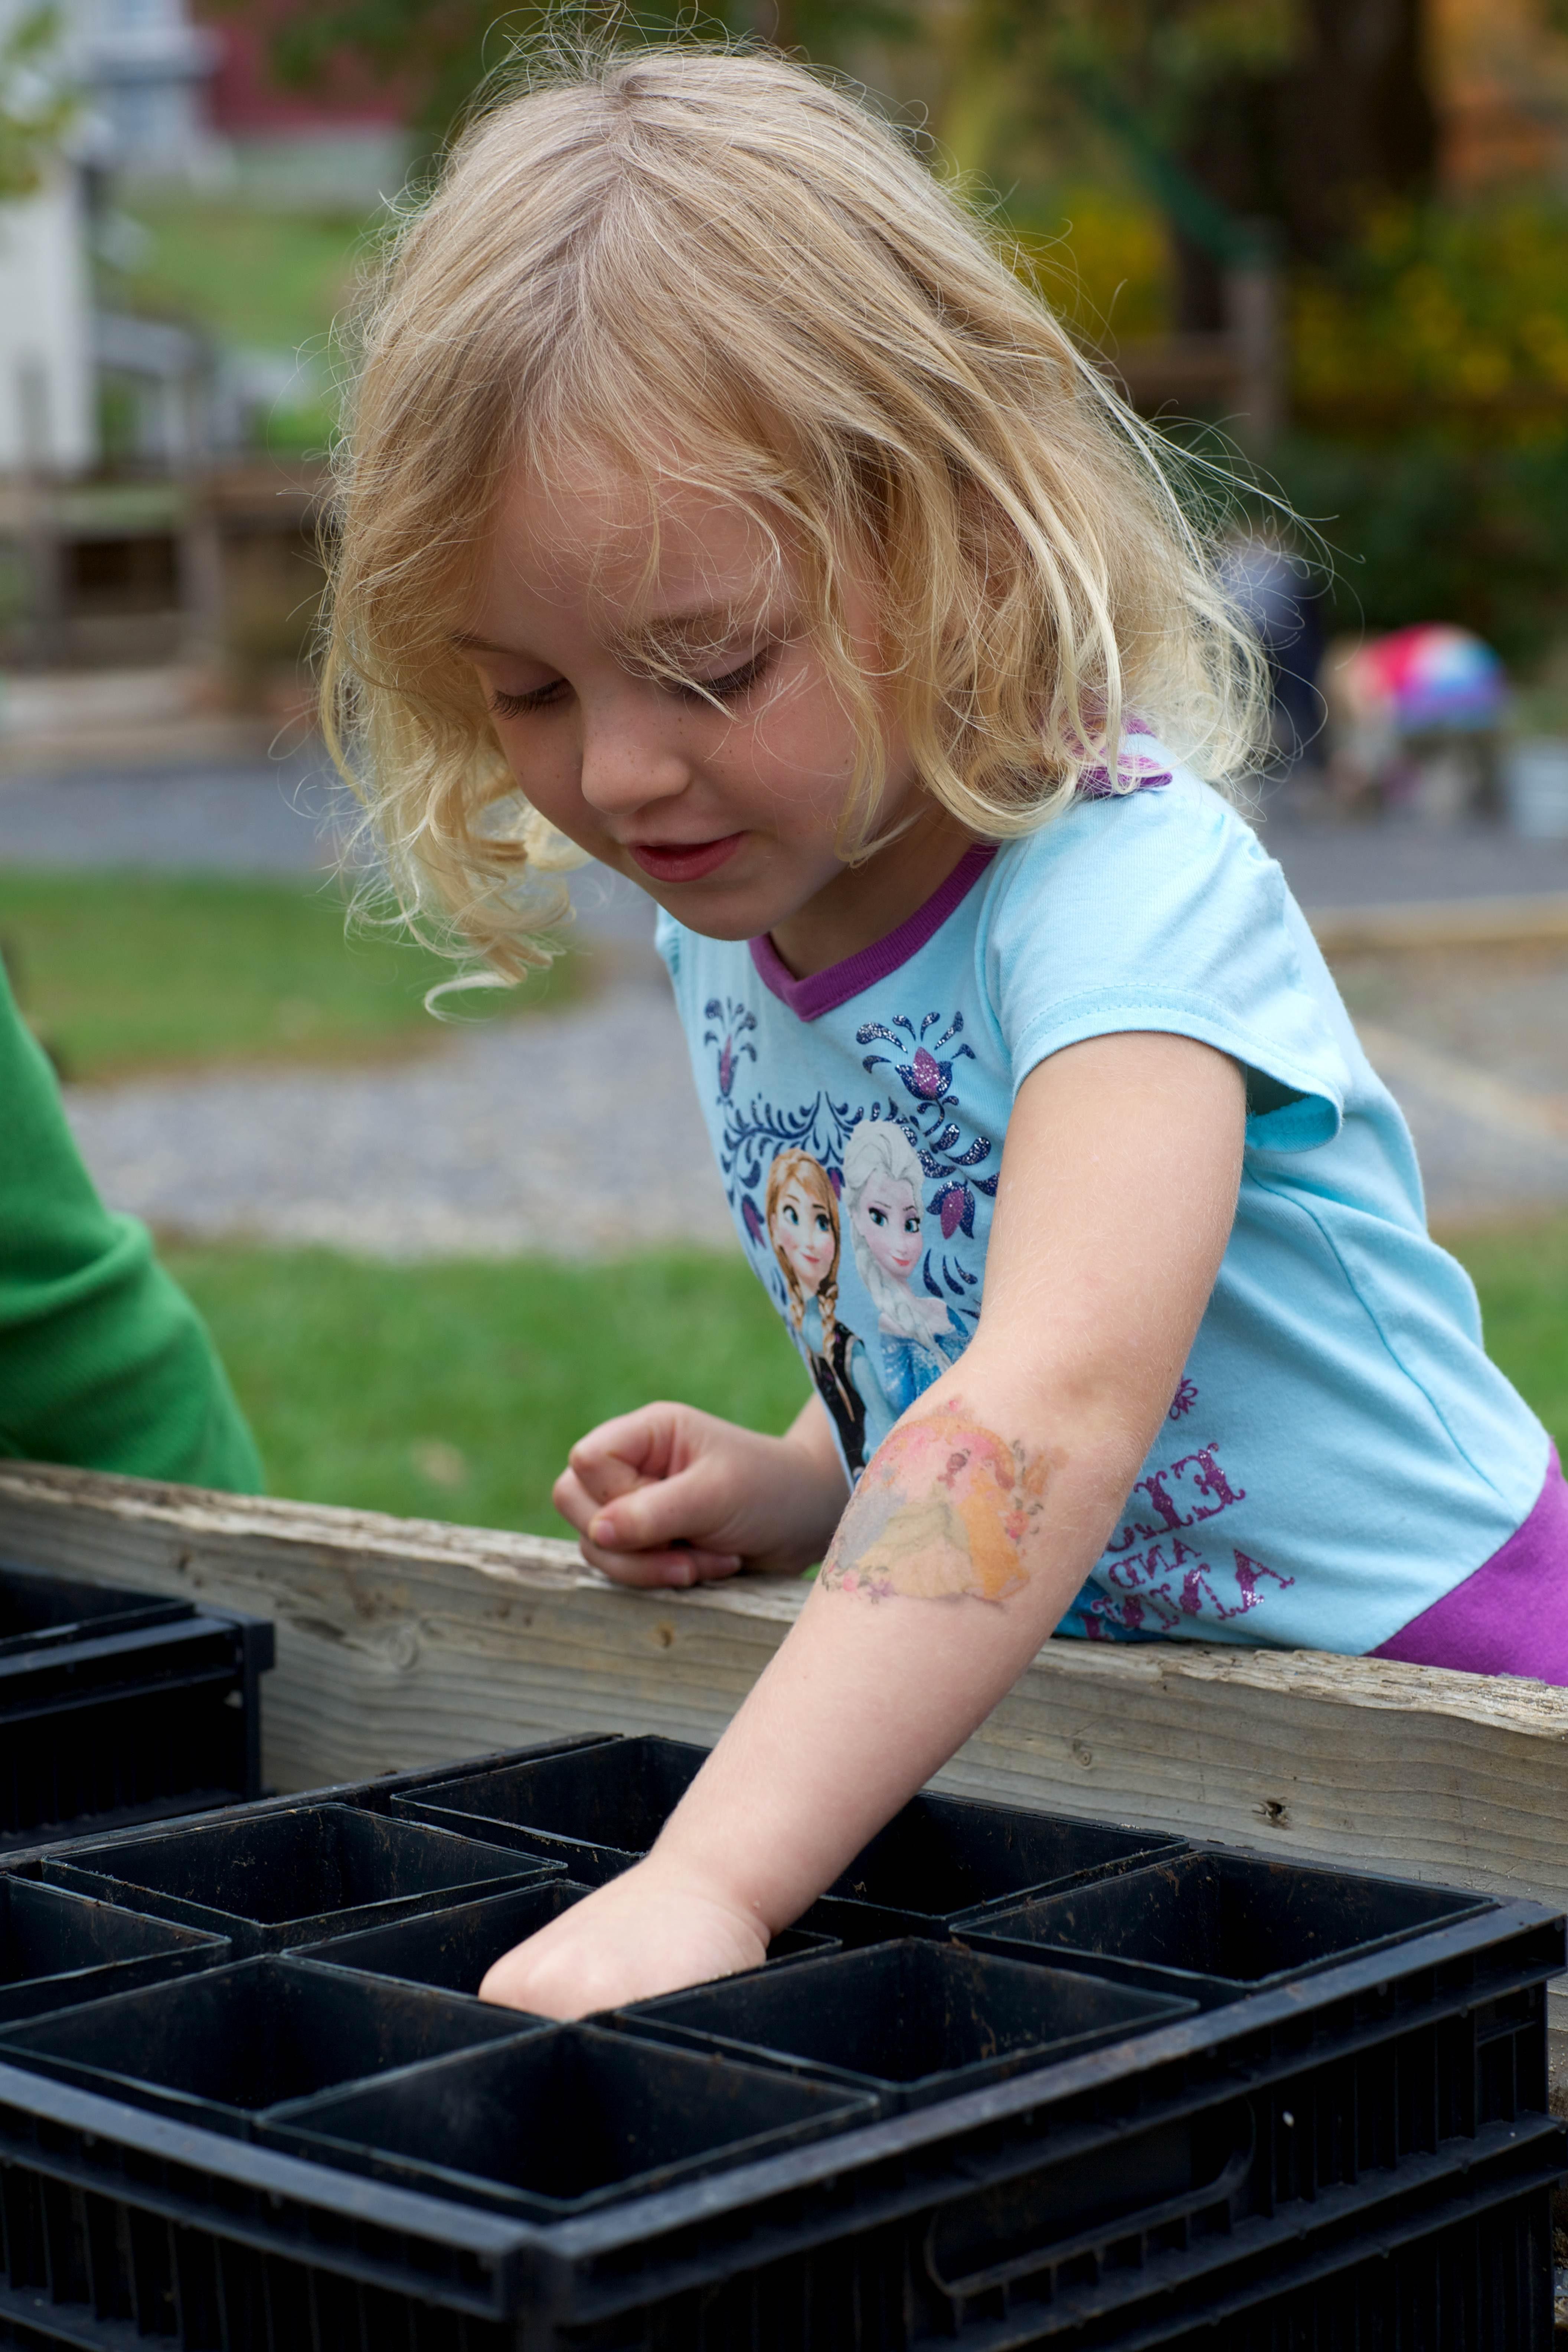 Free photograph; cute, blonde, girl, planting, seeds, pot